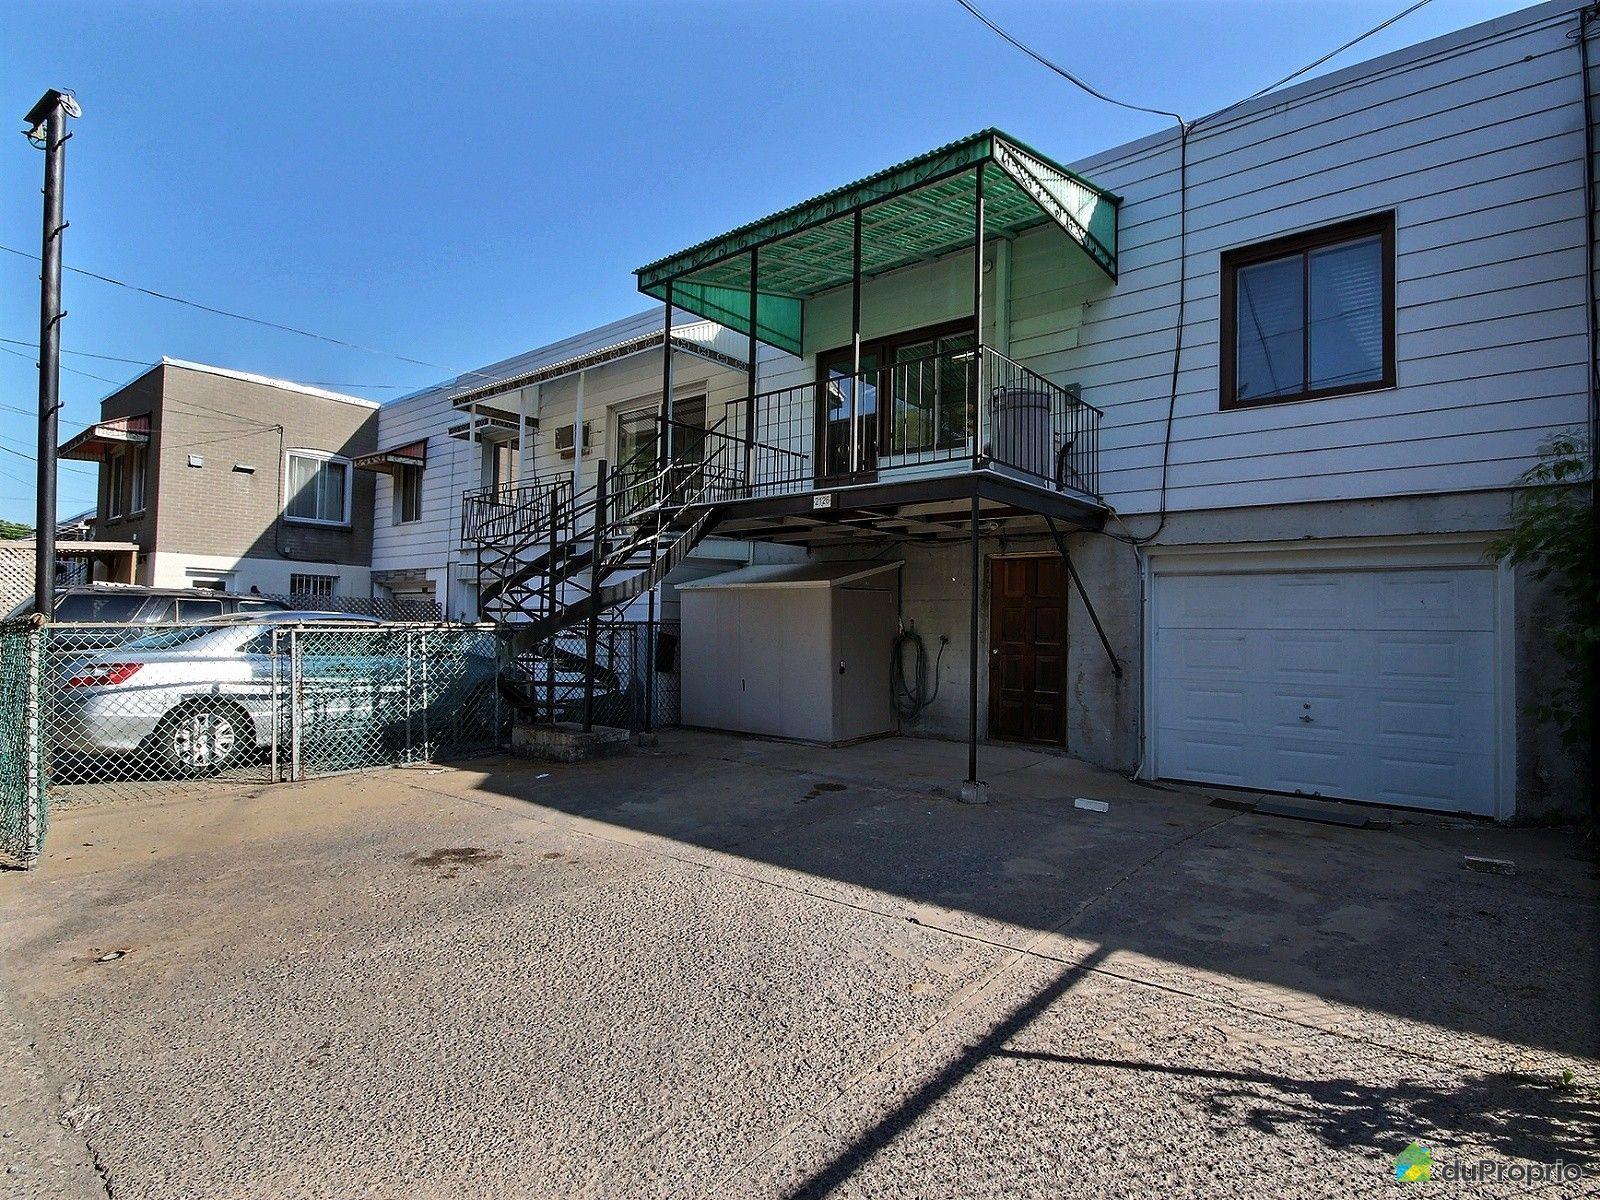 Maison vendre montr al 2126 rue wurtele immobilier for Chauffage piscine quebec